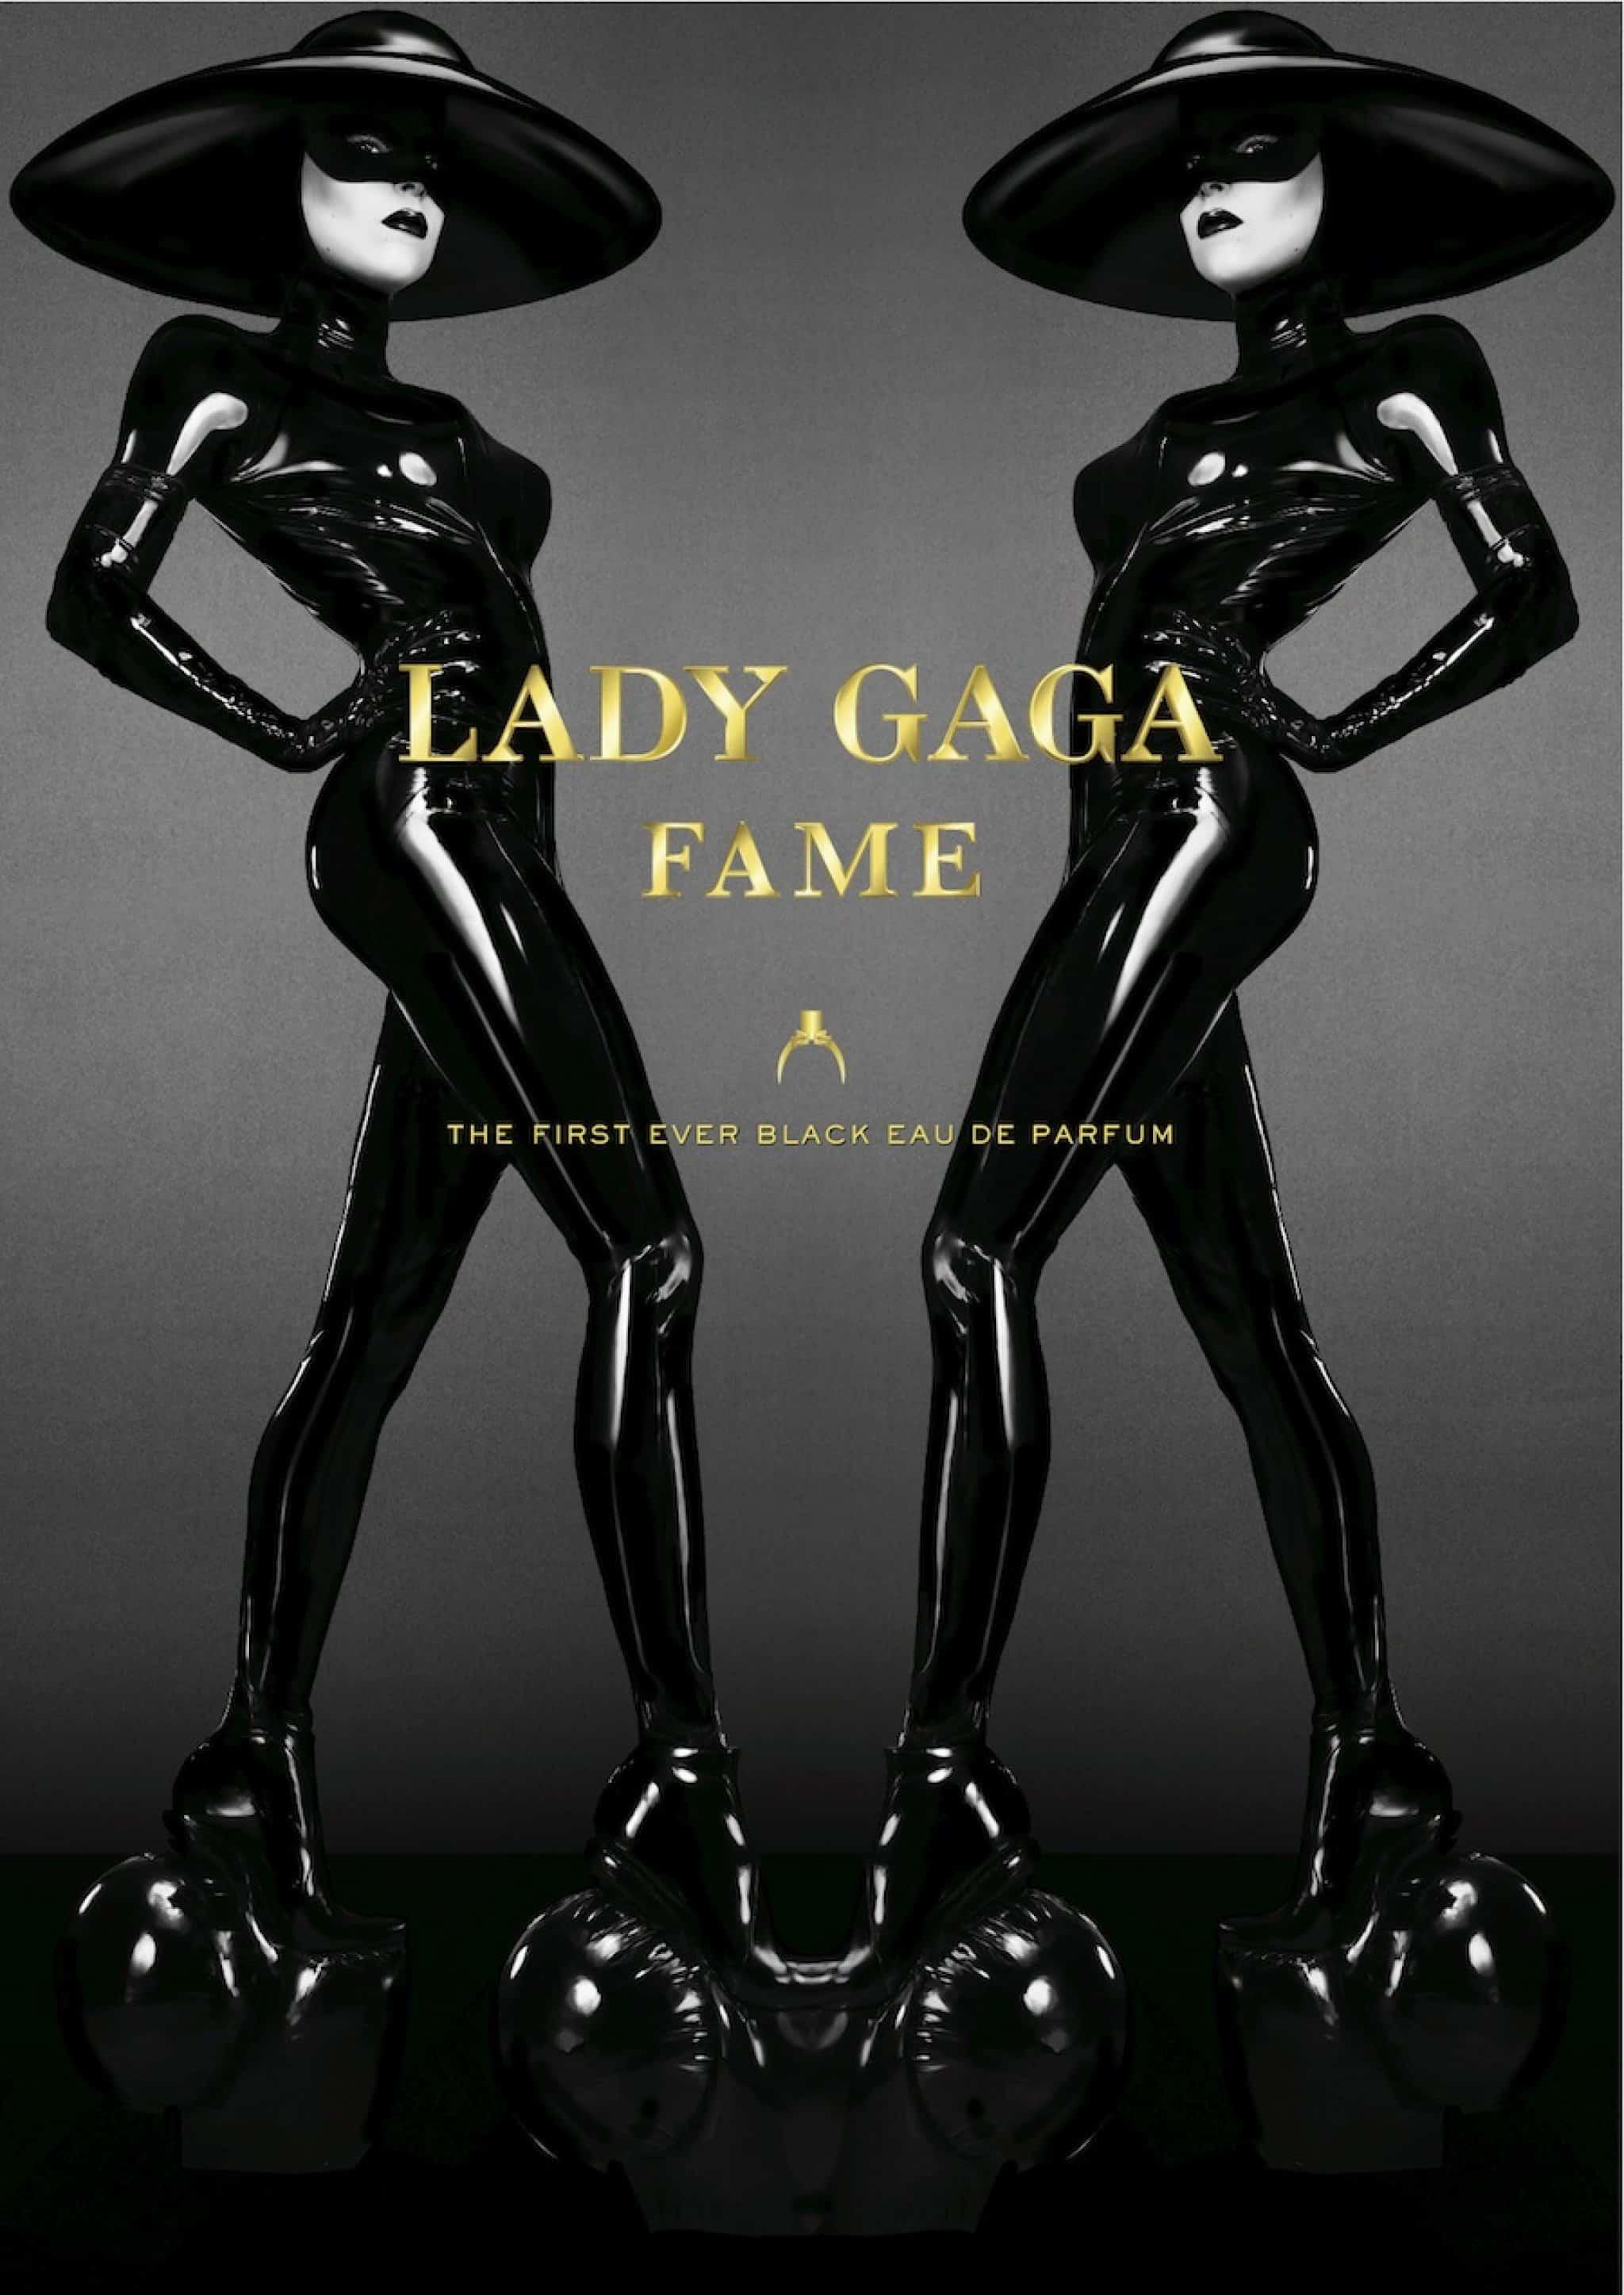 Lady Gaga Gets Naked for Fame Fragrance Ad | E! News